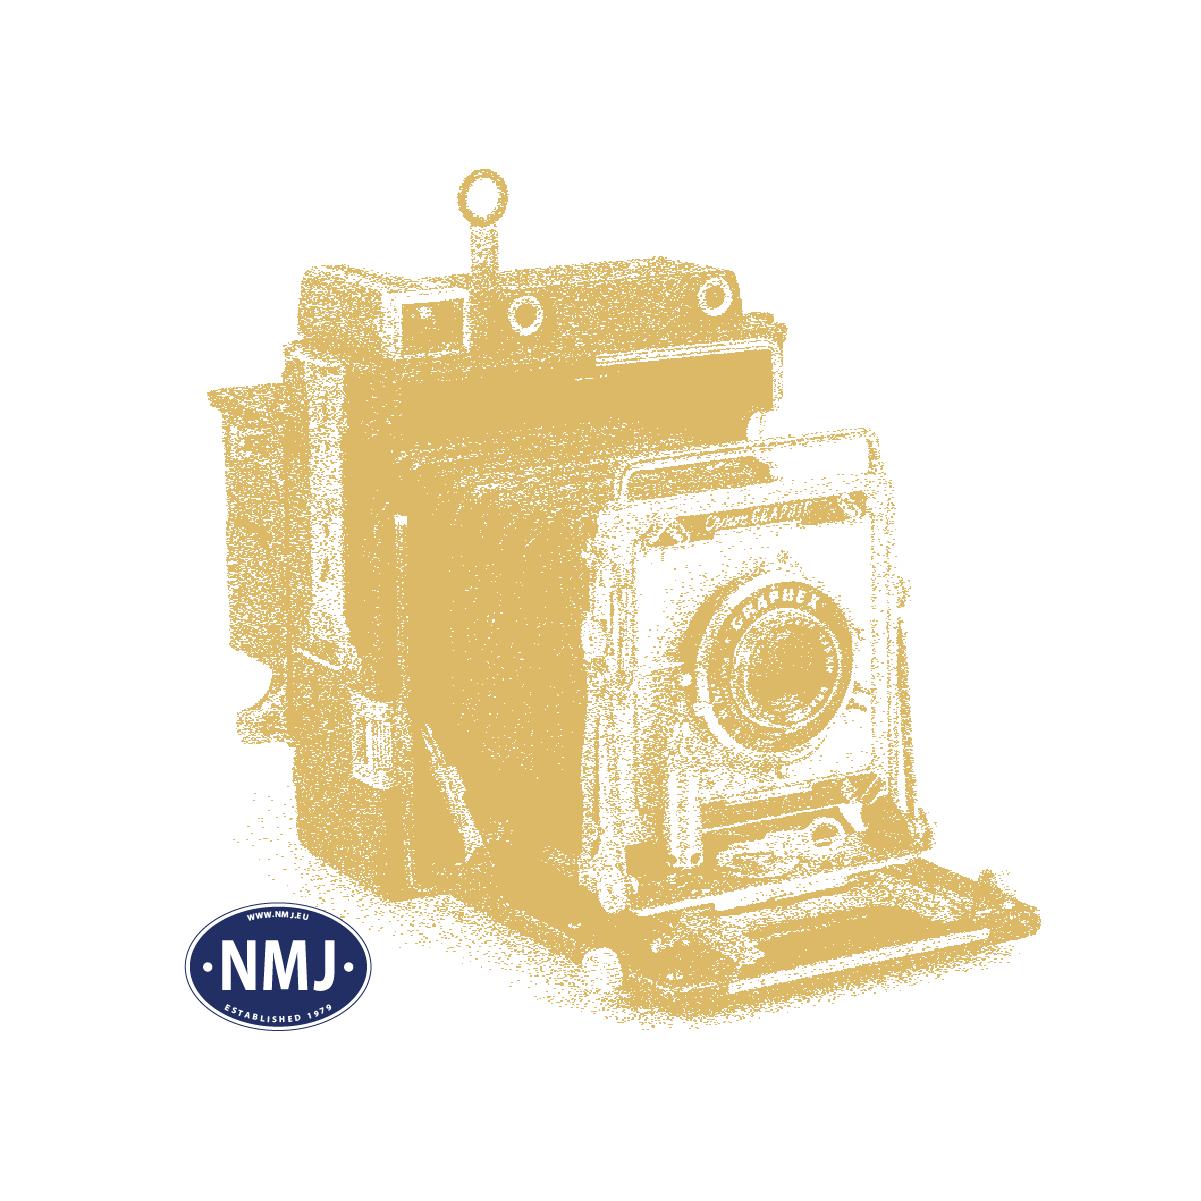 DK-8750074 - PBS Mx 1030, DCC m/ Lyd